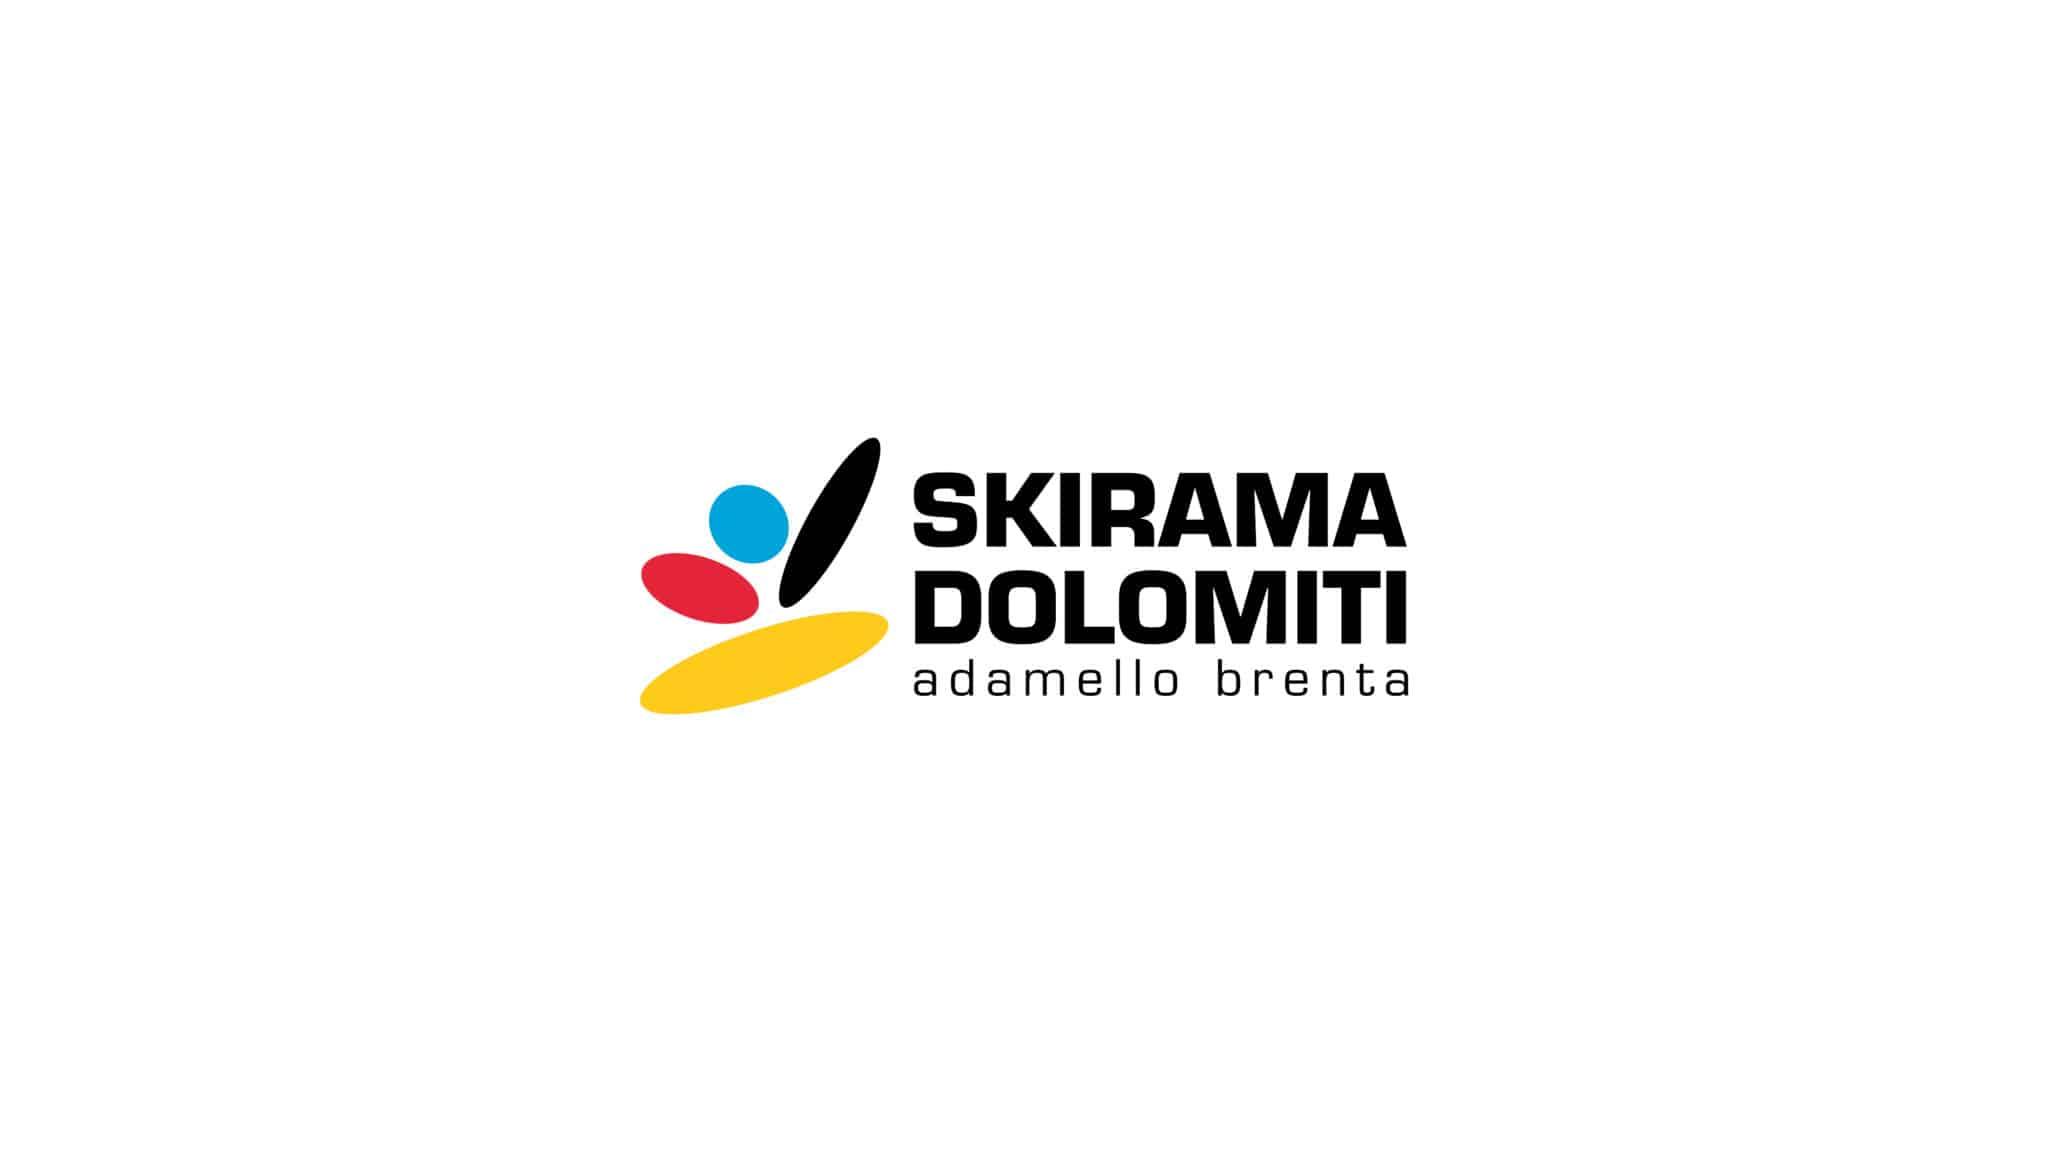 Skirama Dolomiti - logo